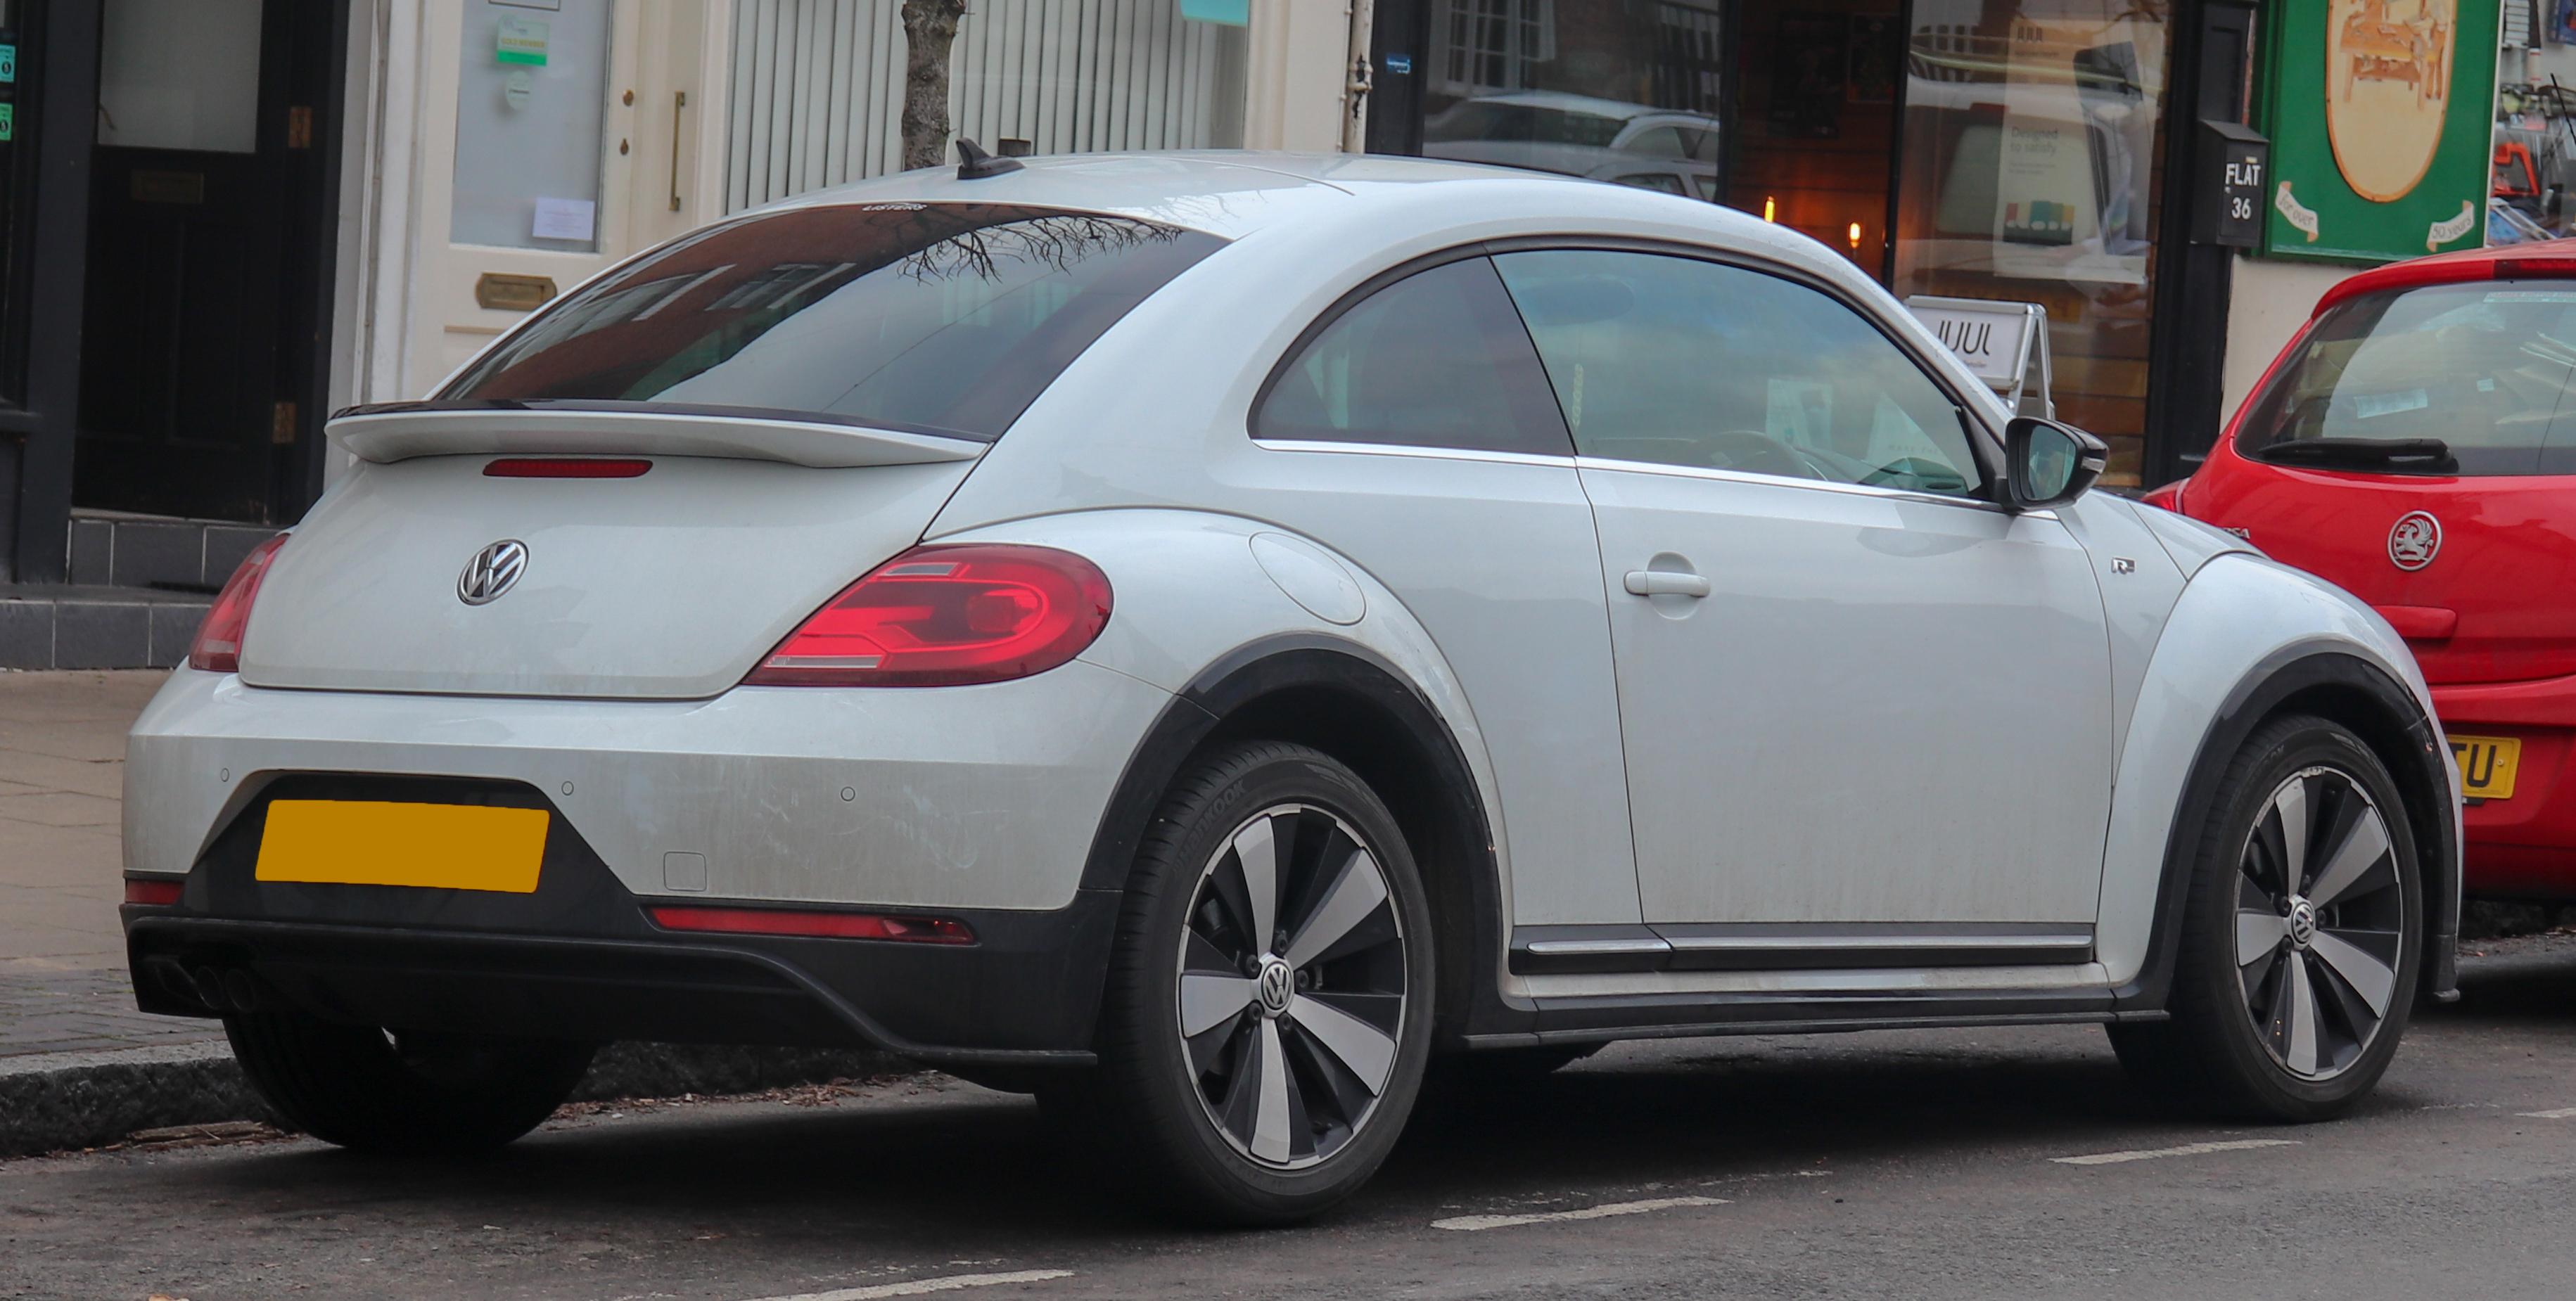 File 2017 Volkswagen Beetle R Line Tdi Bluemotion 2 0 Rear Jpg